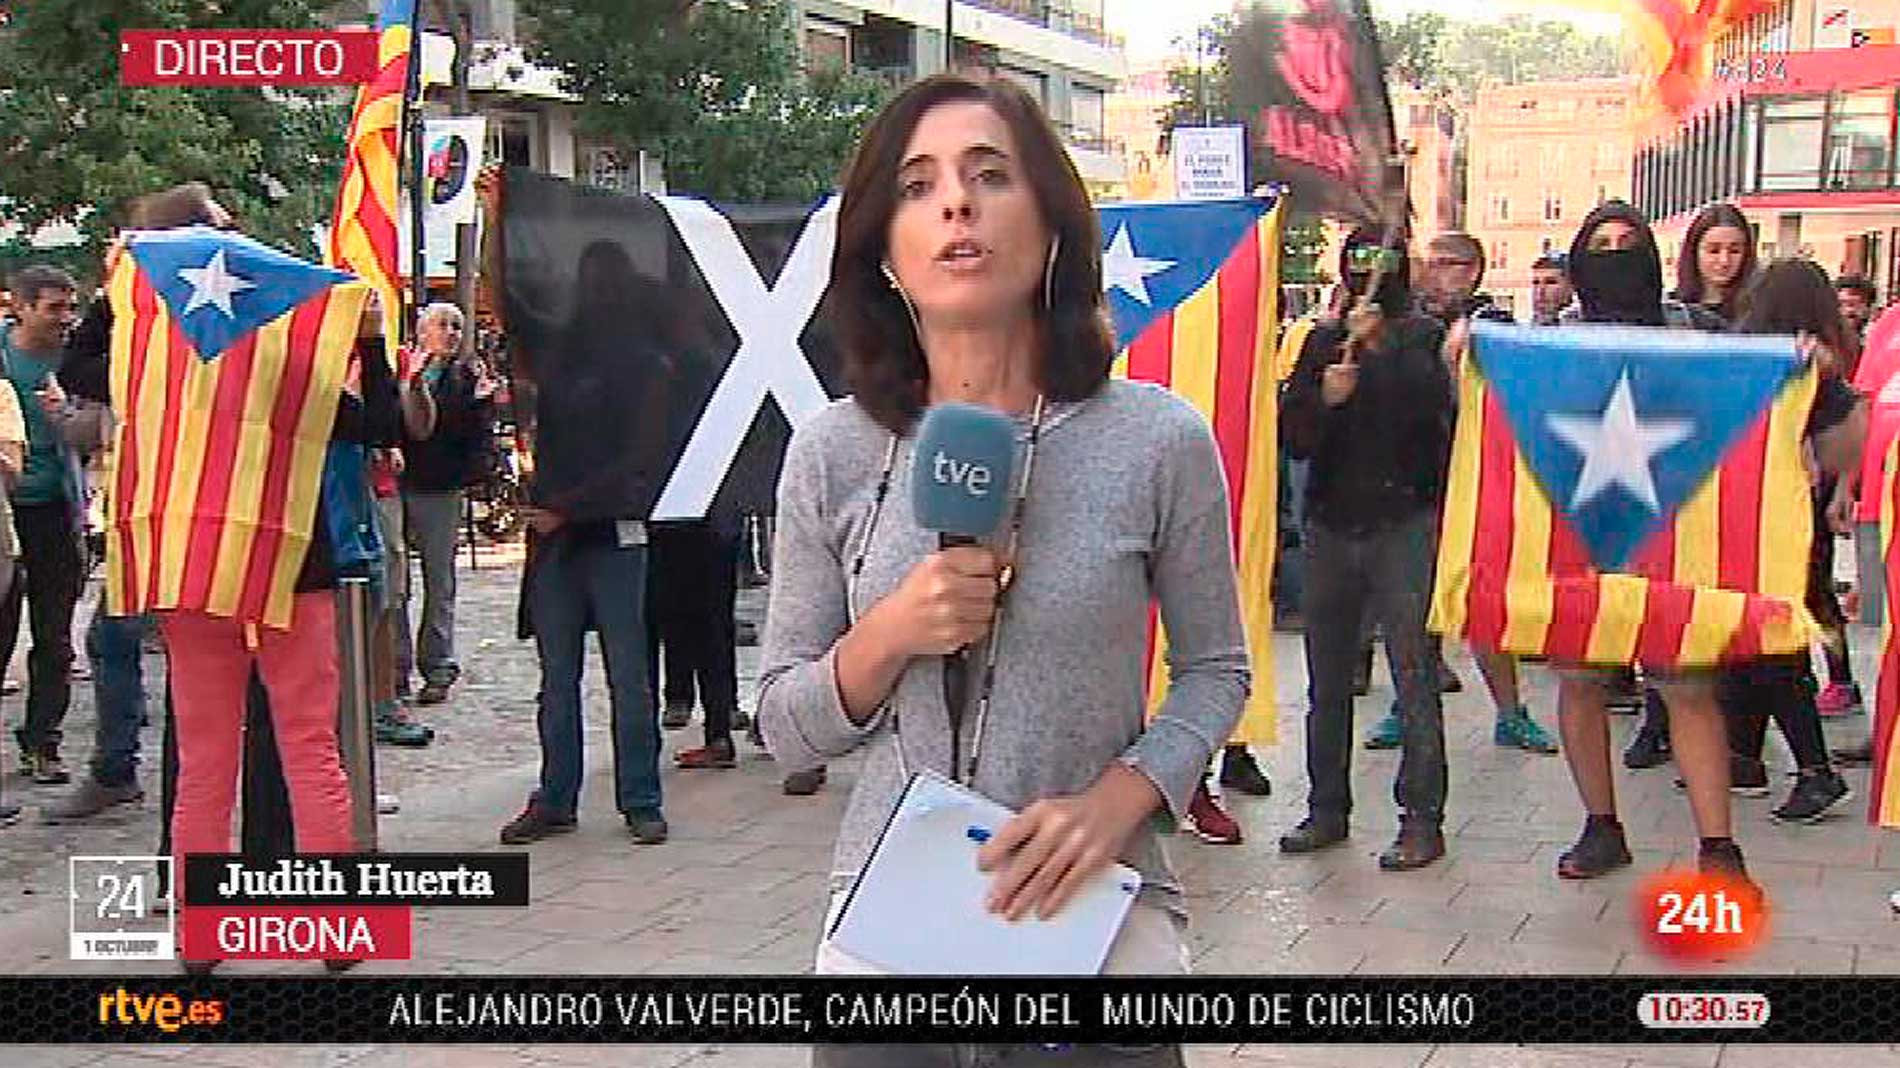 Ir al VideoManifestantes independentistas boicotean a una reportera de TVE en Girona